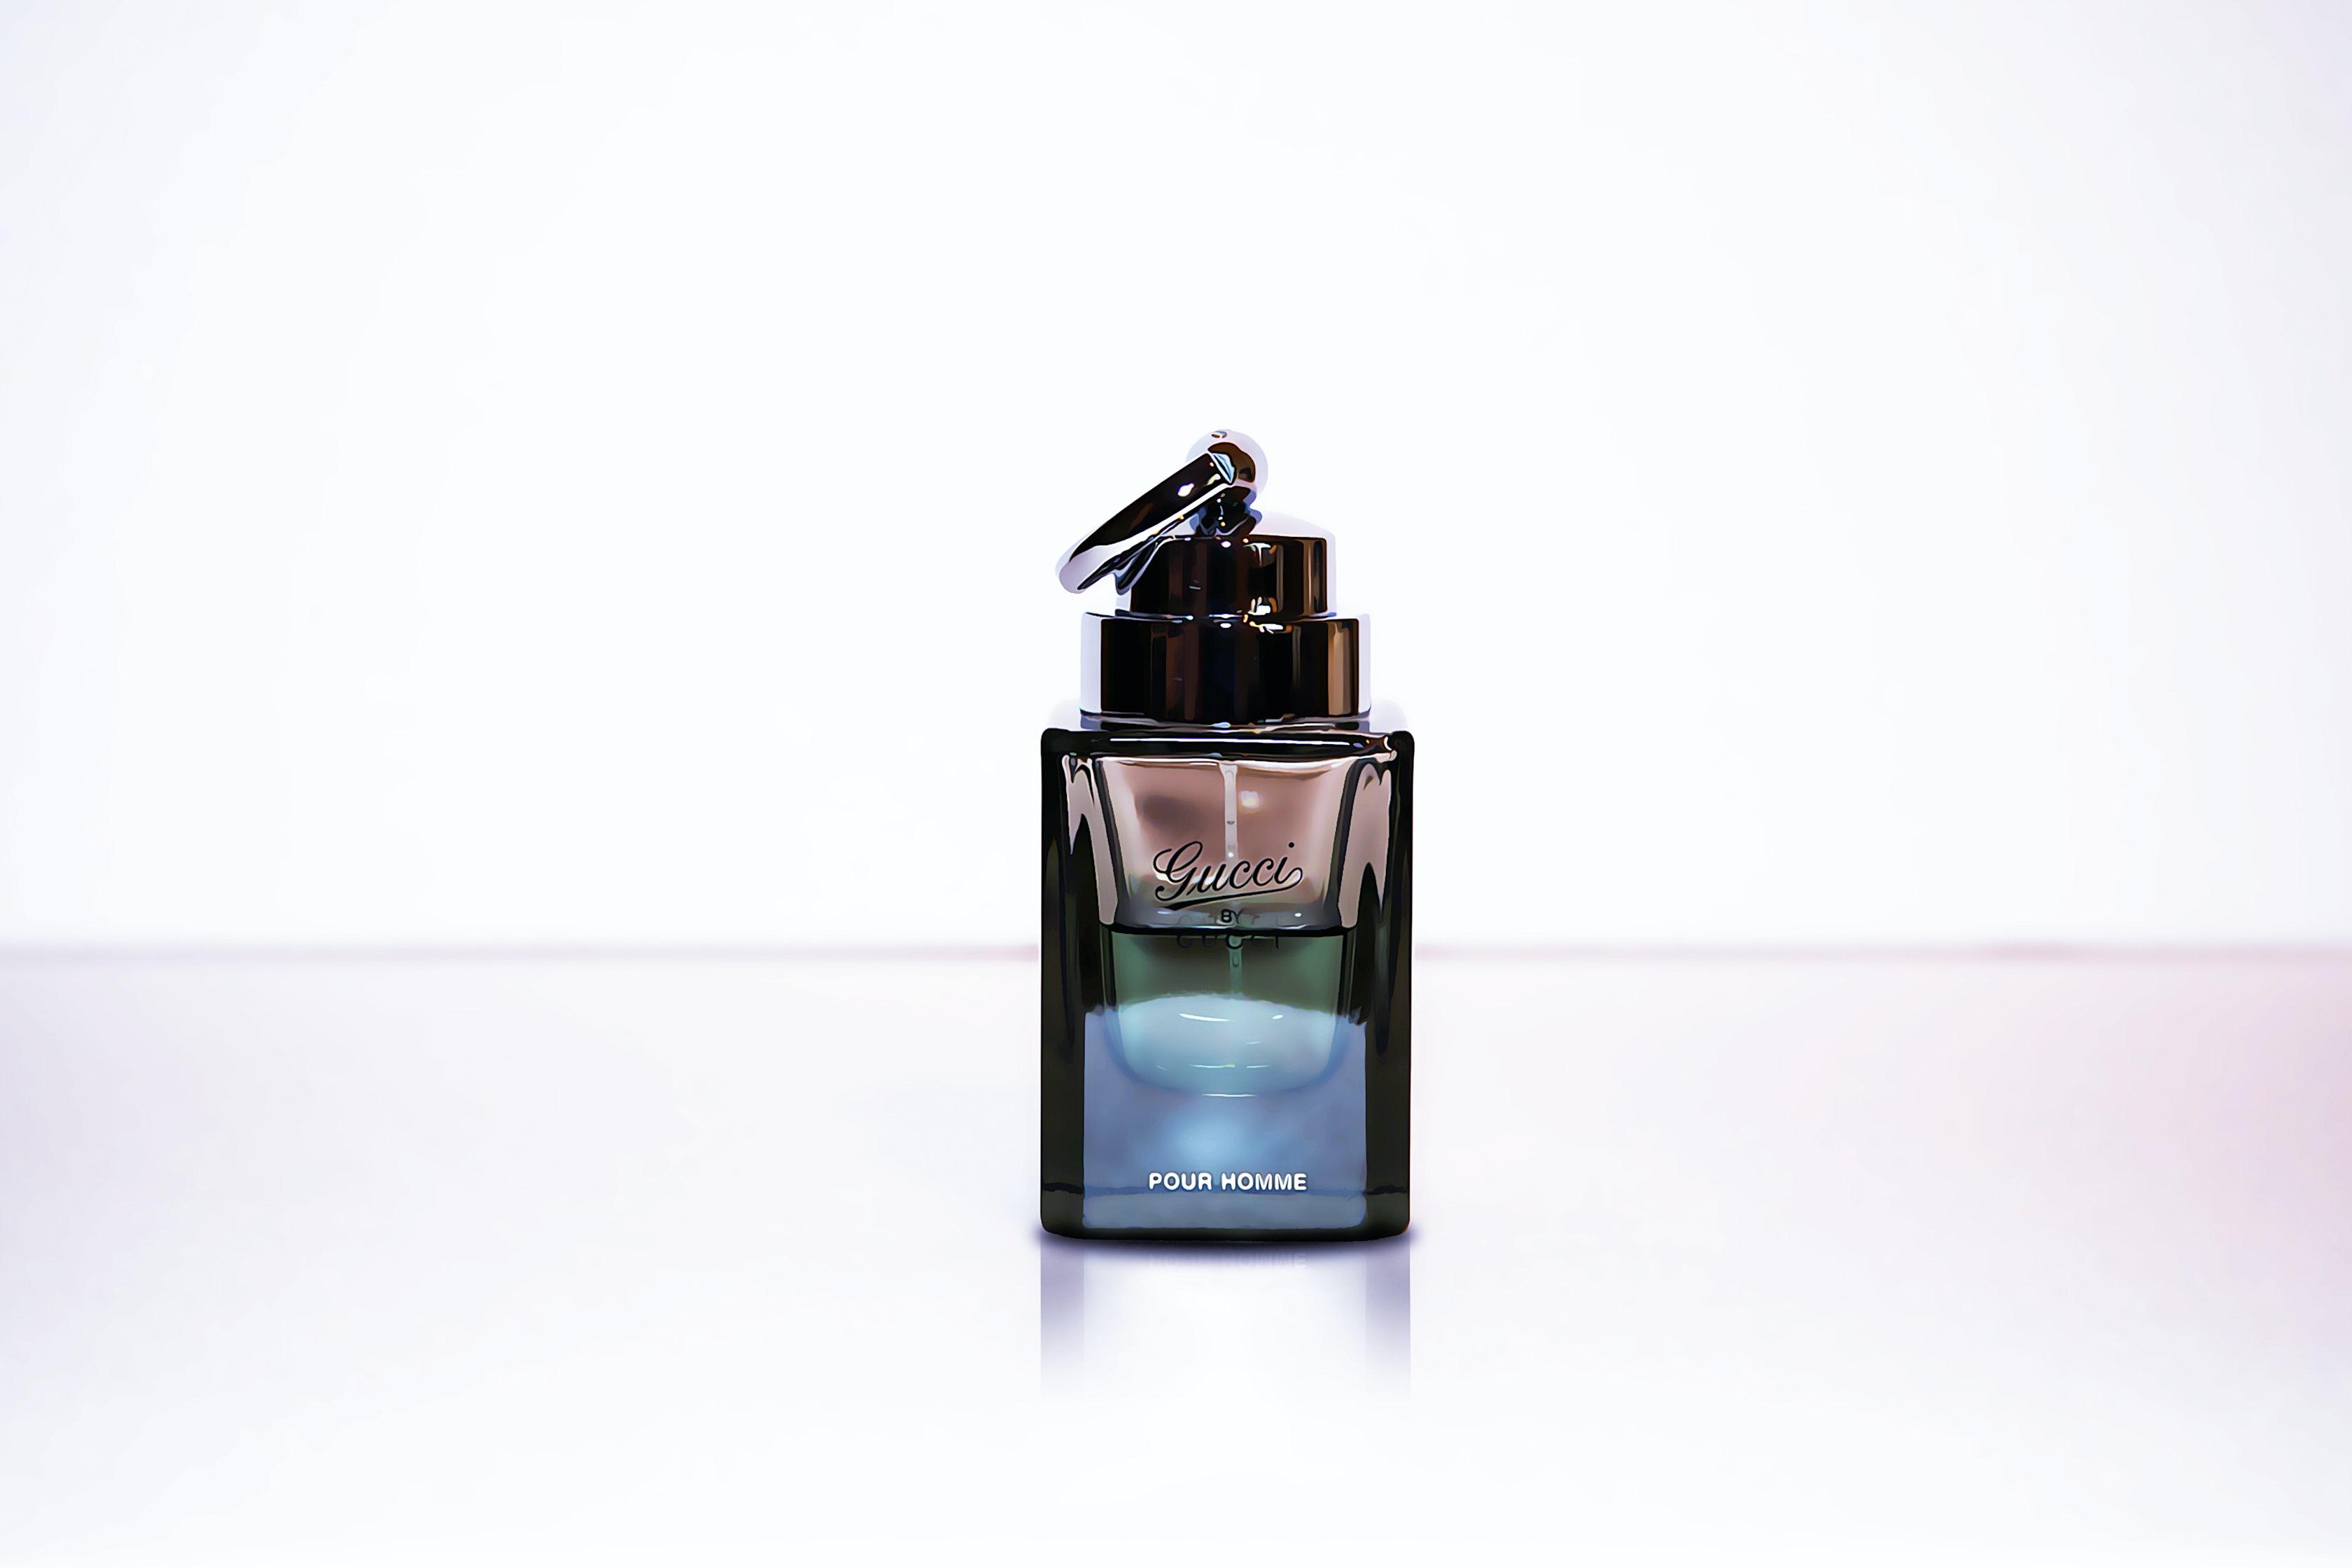 Free Stock Photo Of Gucci Perfume